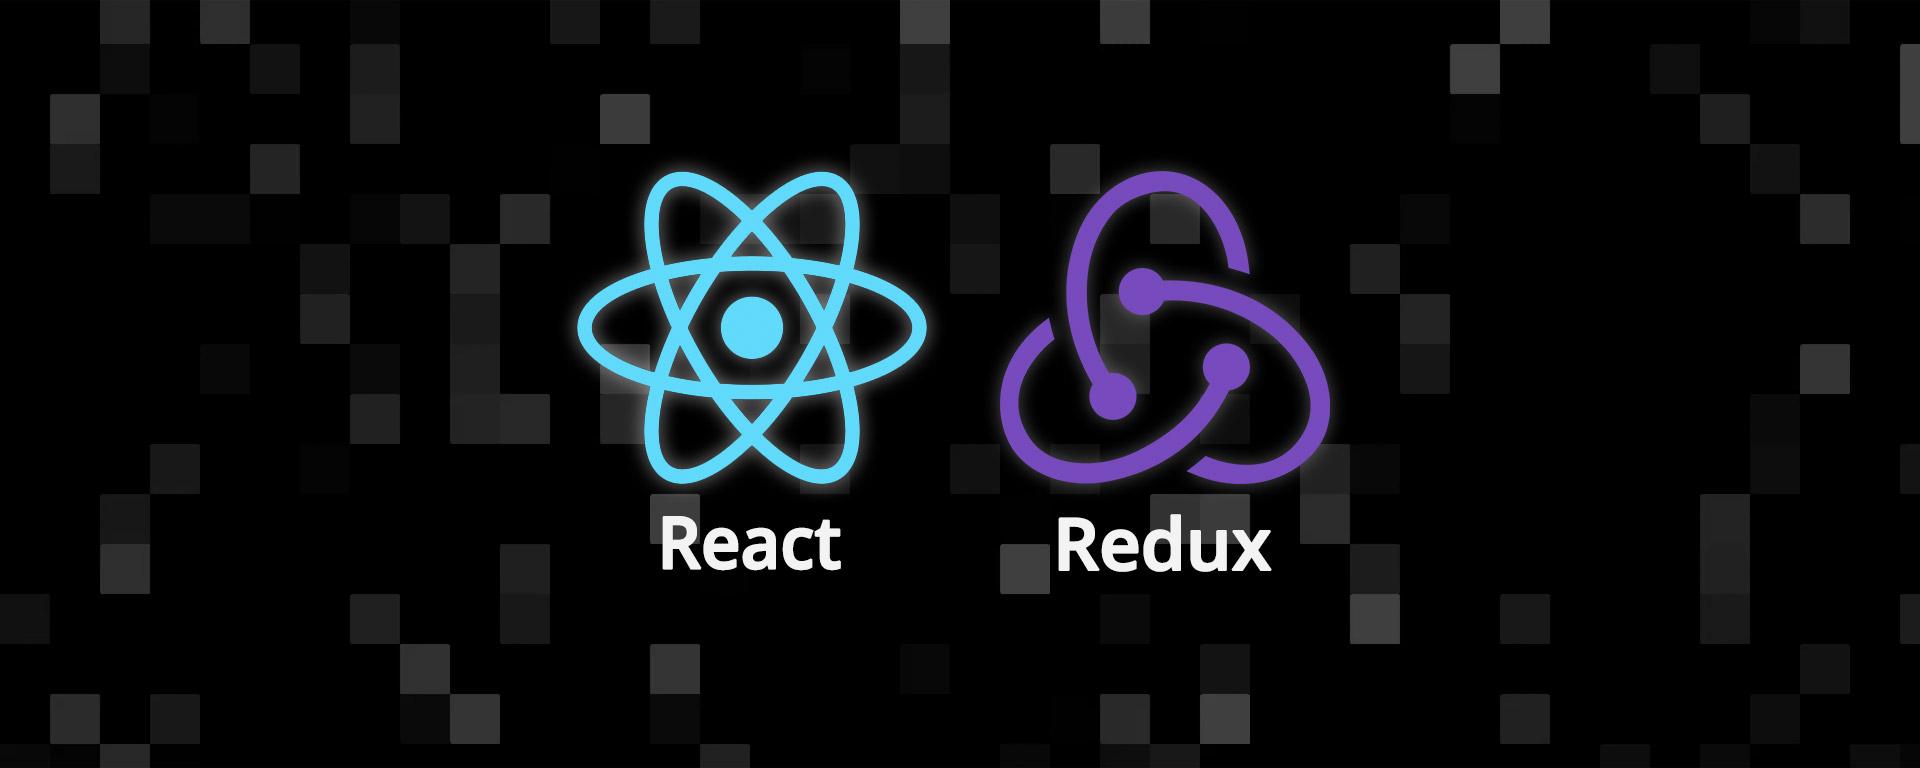 React 本体のみで Redux フレンドリーな非同期処理を実現するアイデア